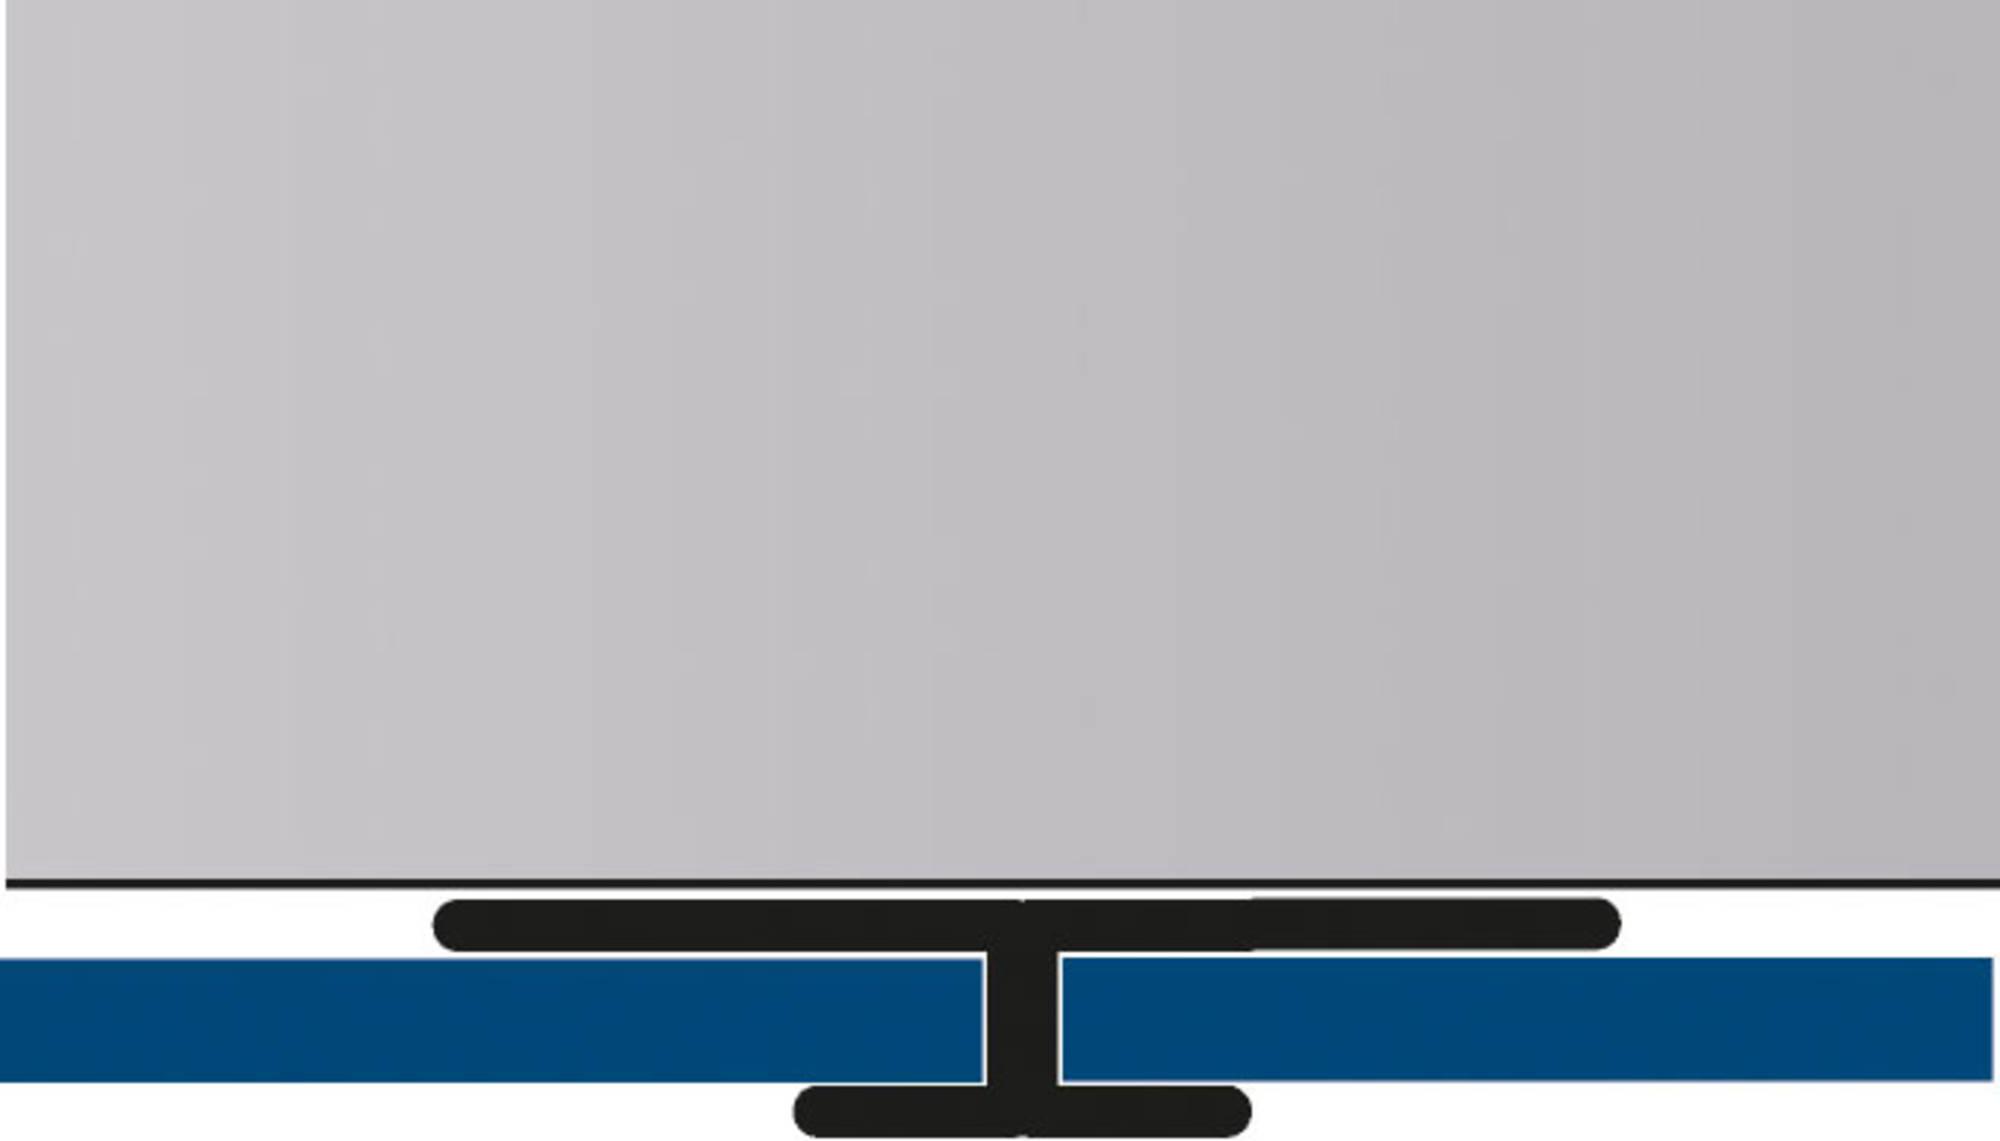 Duschprofi RenoVetro koppelprofiel 2,3x0,7 cm chroomoptiek